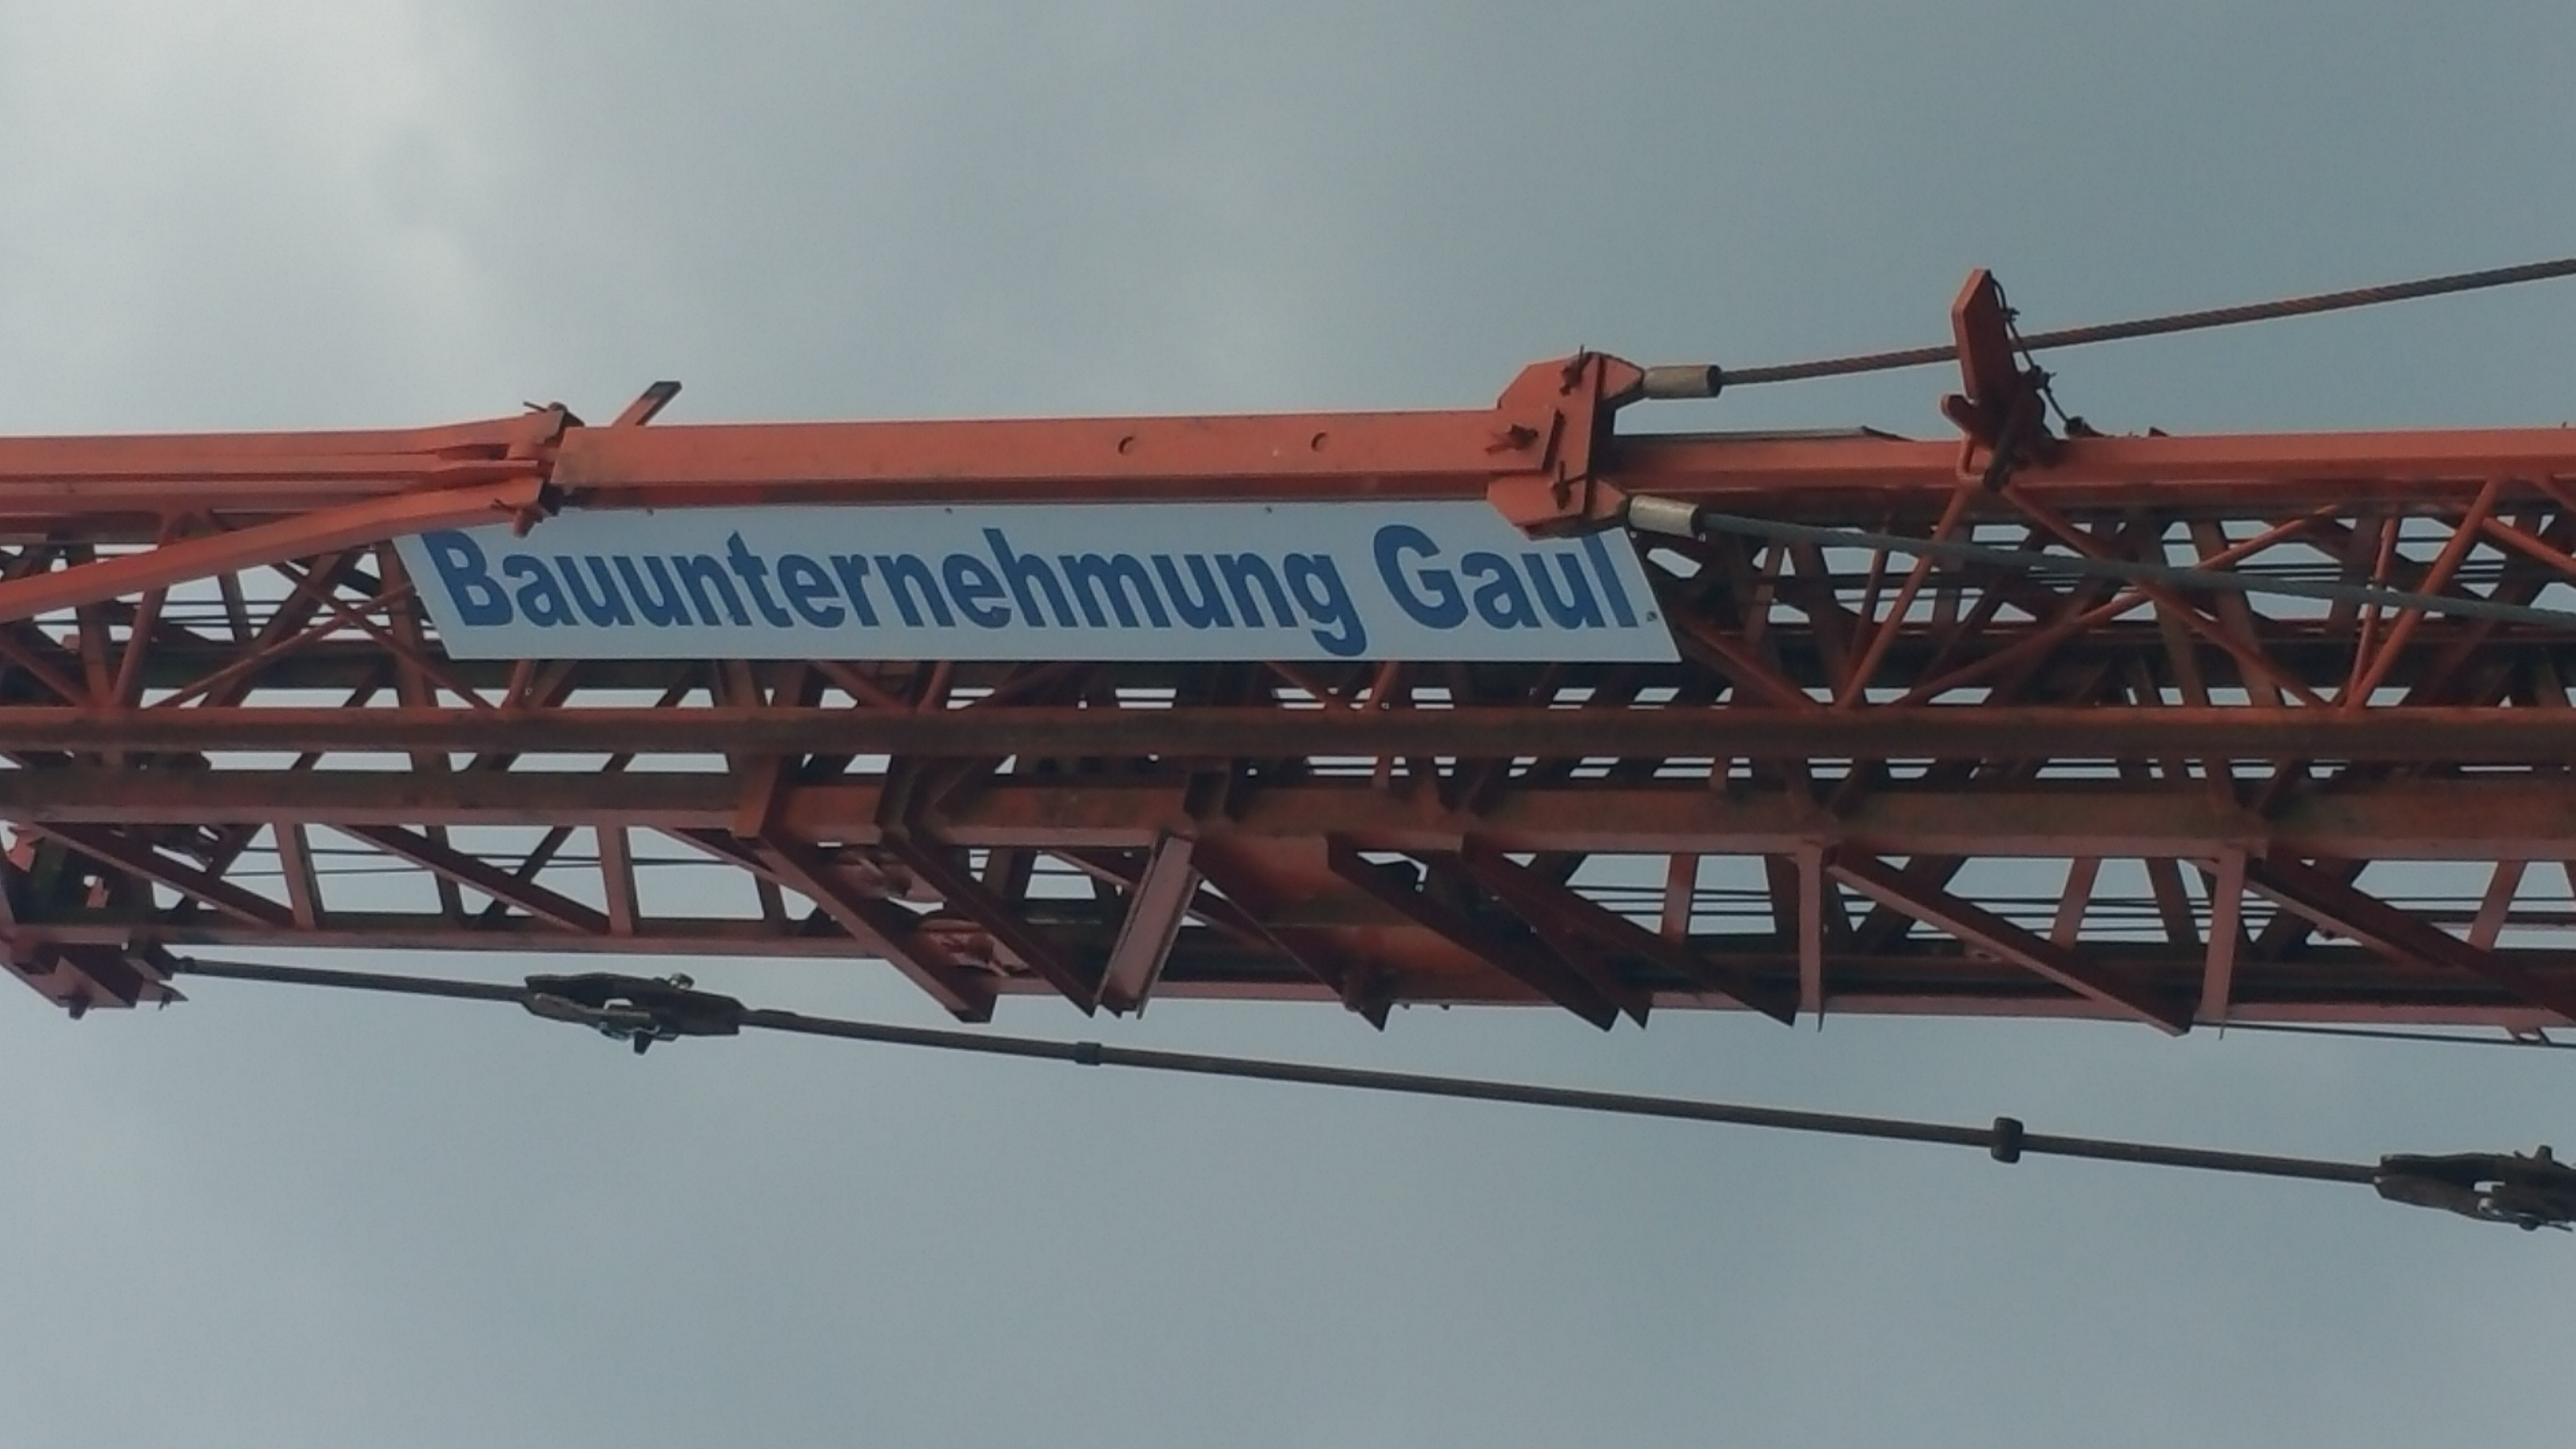 Bauunternehmung Gaul